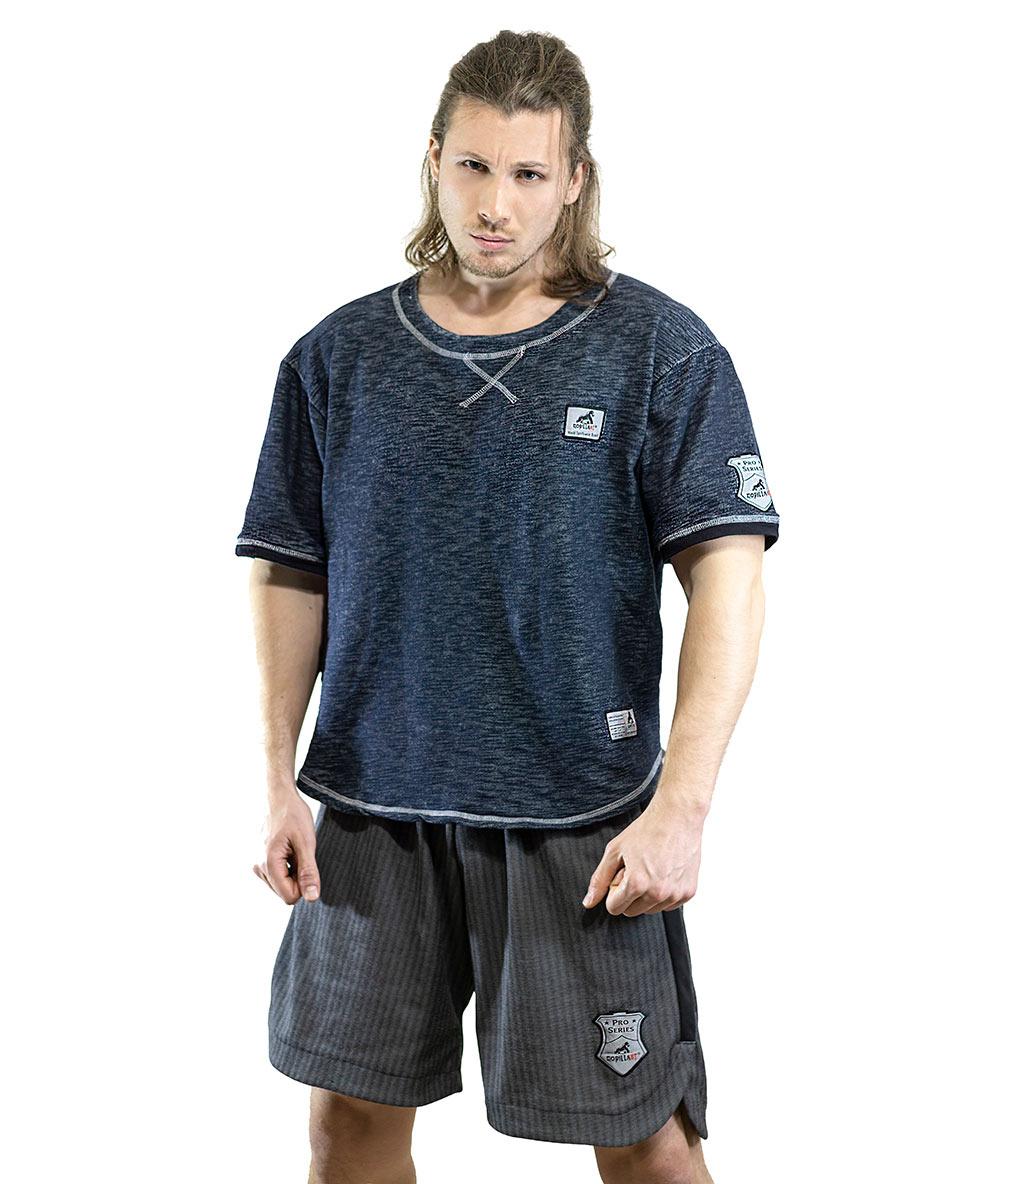 Gorillast Ant Kırçıllı T-Shirt Lacivert